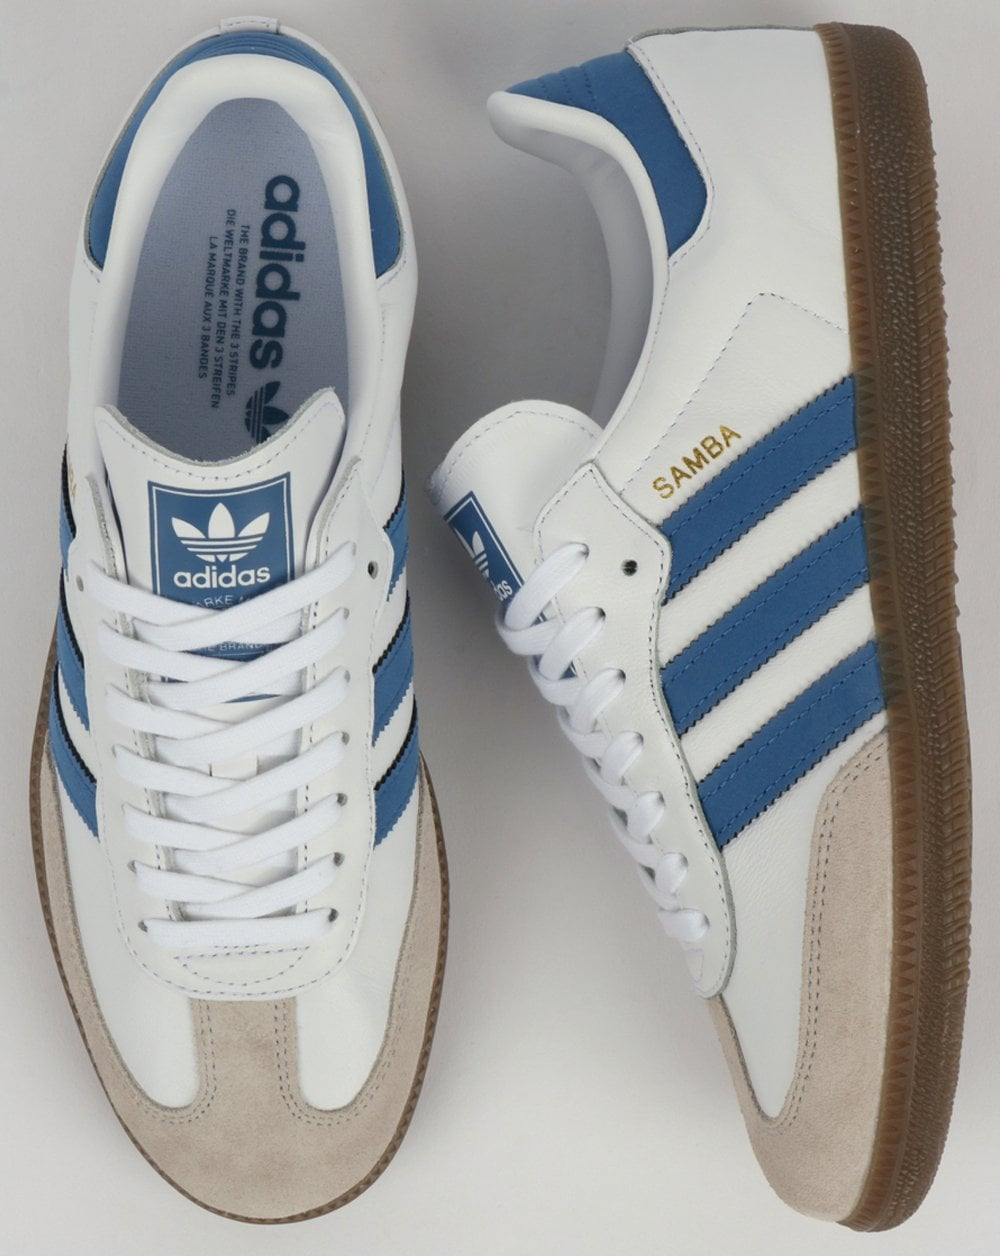 adidas Originals Samba Trainers Royal